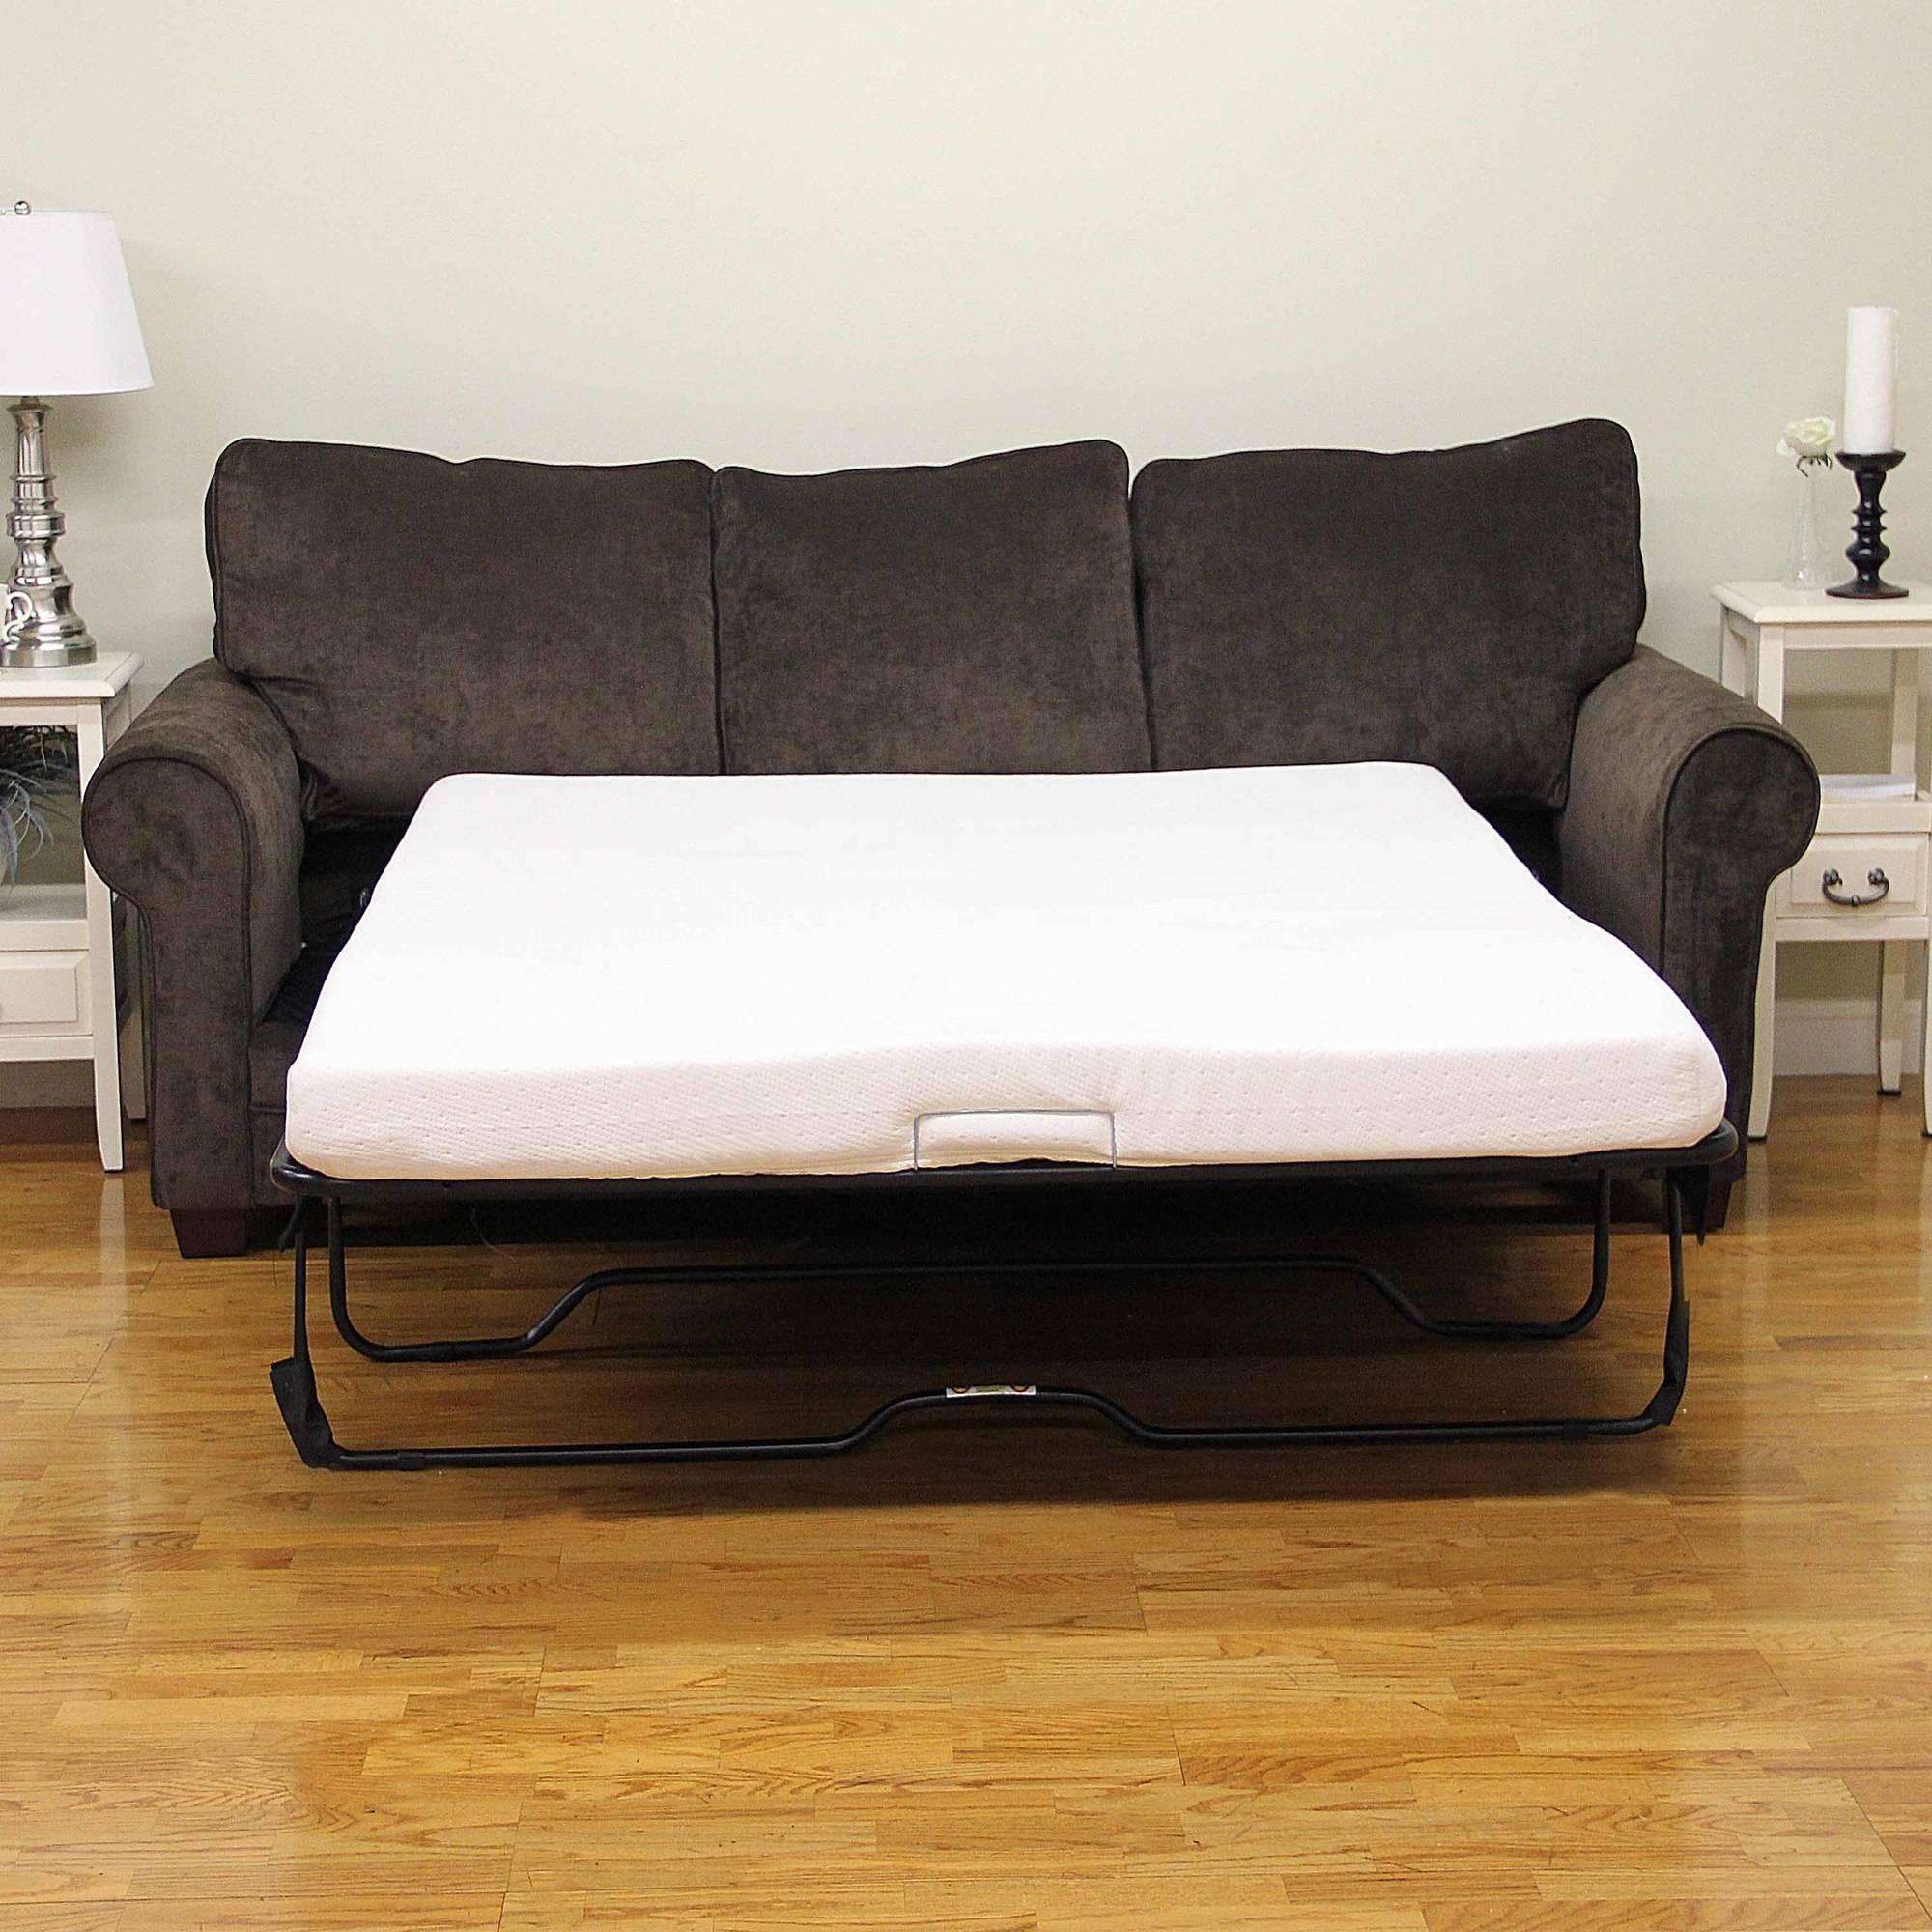 Fascinating 60+ Sofa Sleeper Walmart Inspiration Design Of Sofas Regarding Mainstays Sleeper Sofas (Image 2 of 20)